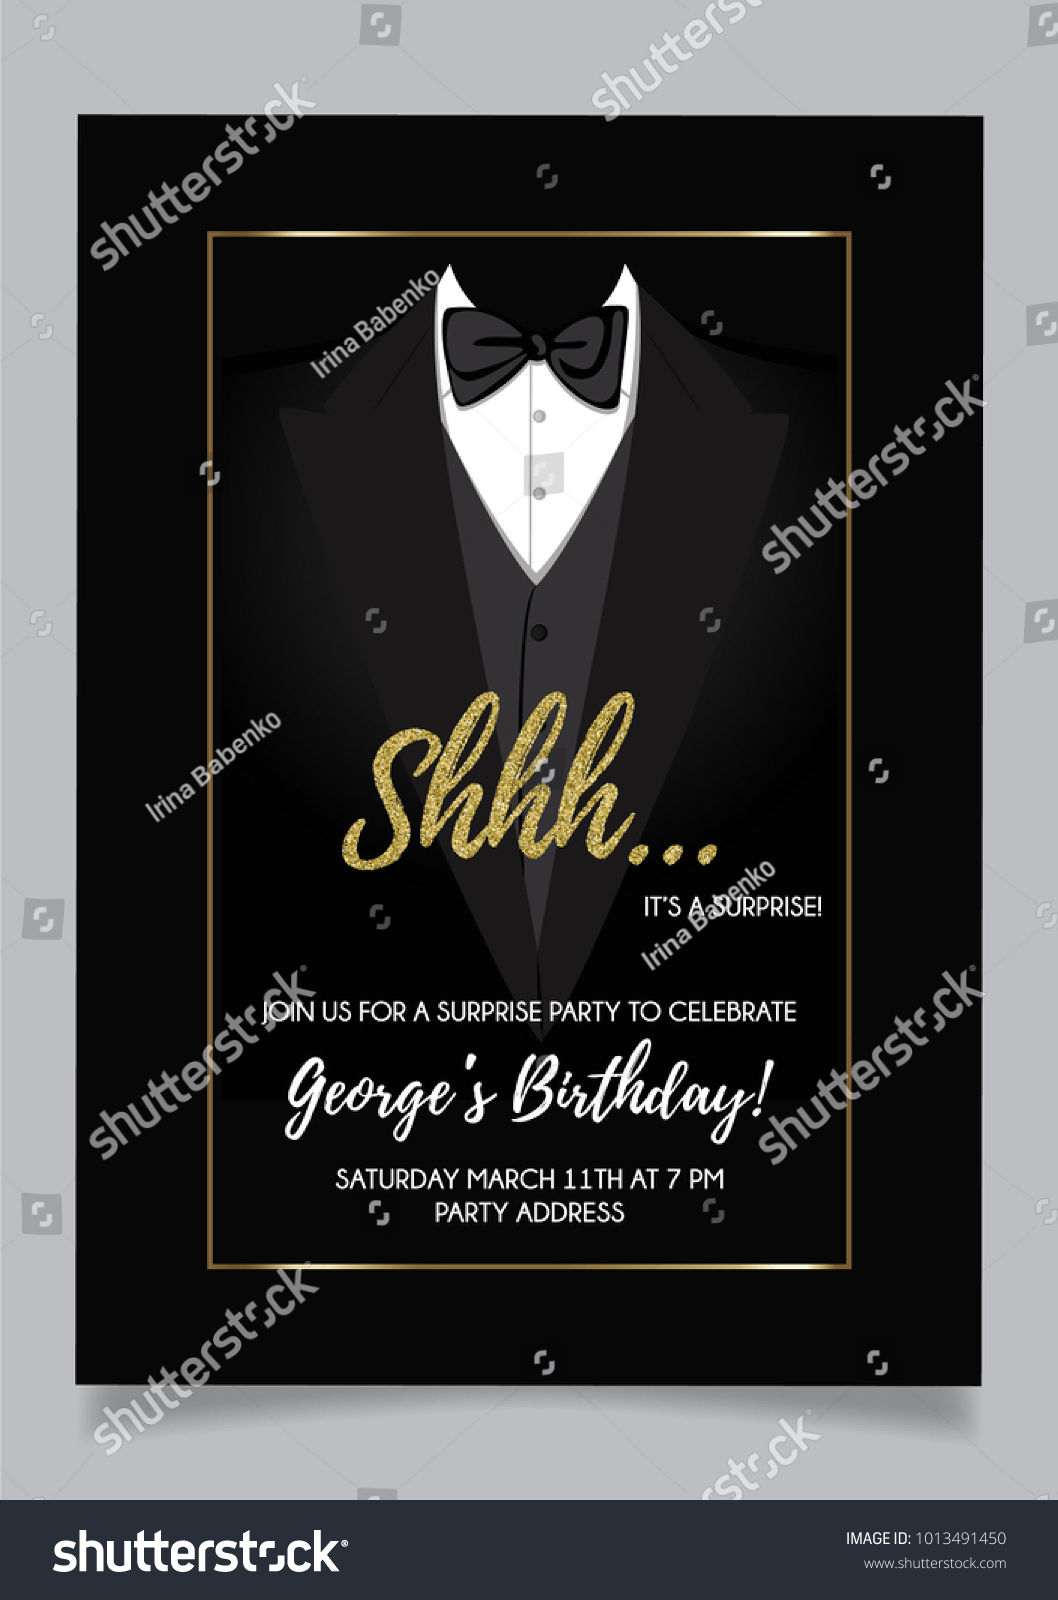 shh surprise party invitation card vector のベクター画像素材